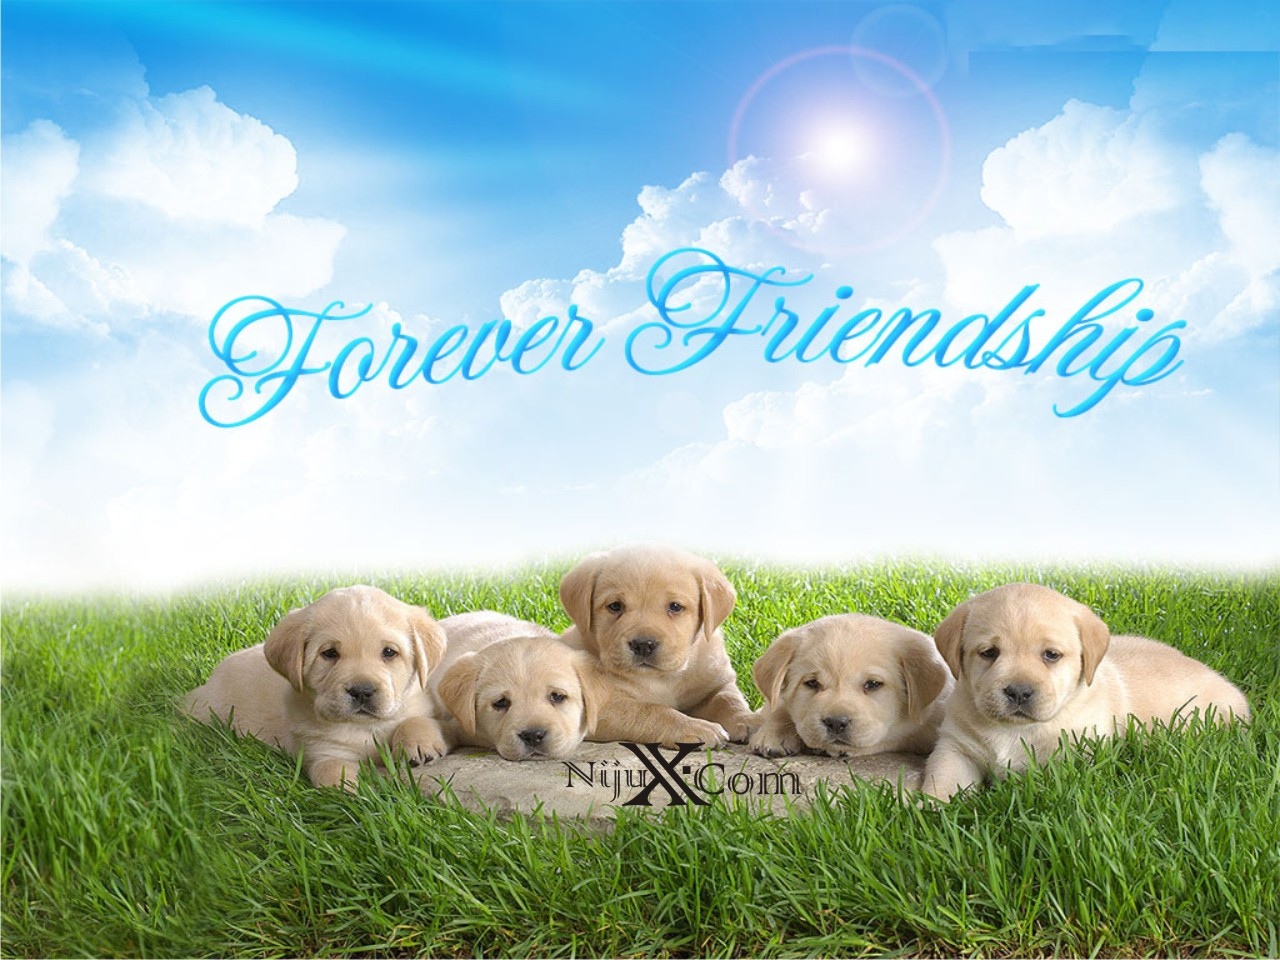 http://4.bp.blogspot.com/-nAfrKY6rUTI/UB4o8zYgSqI/AAAAAAAAA1g/EnR_CtFSvGQ/s1600/friendship-day4.jpg